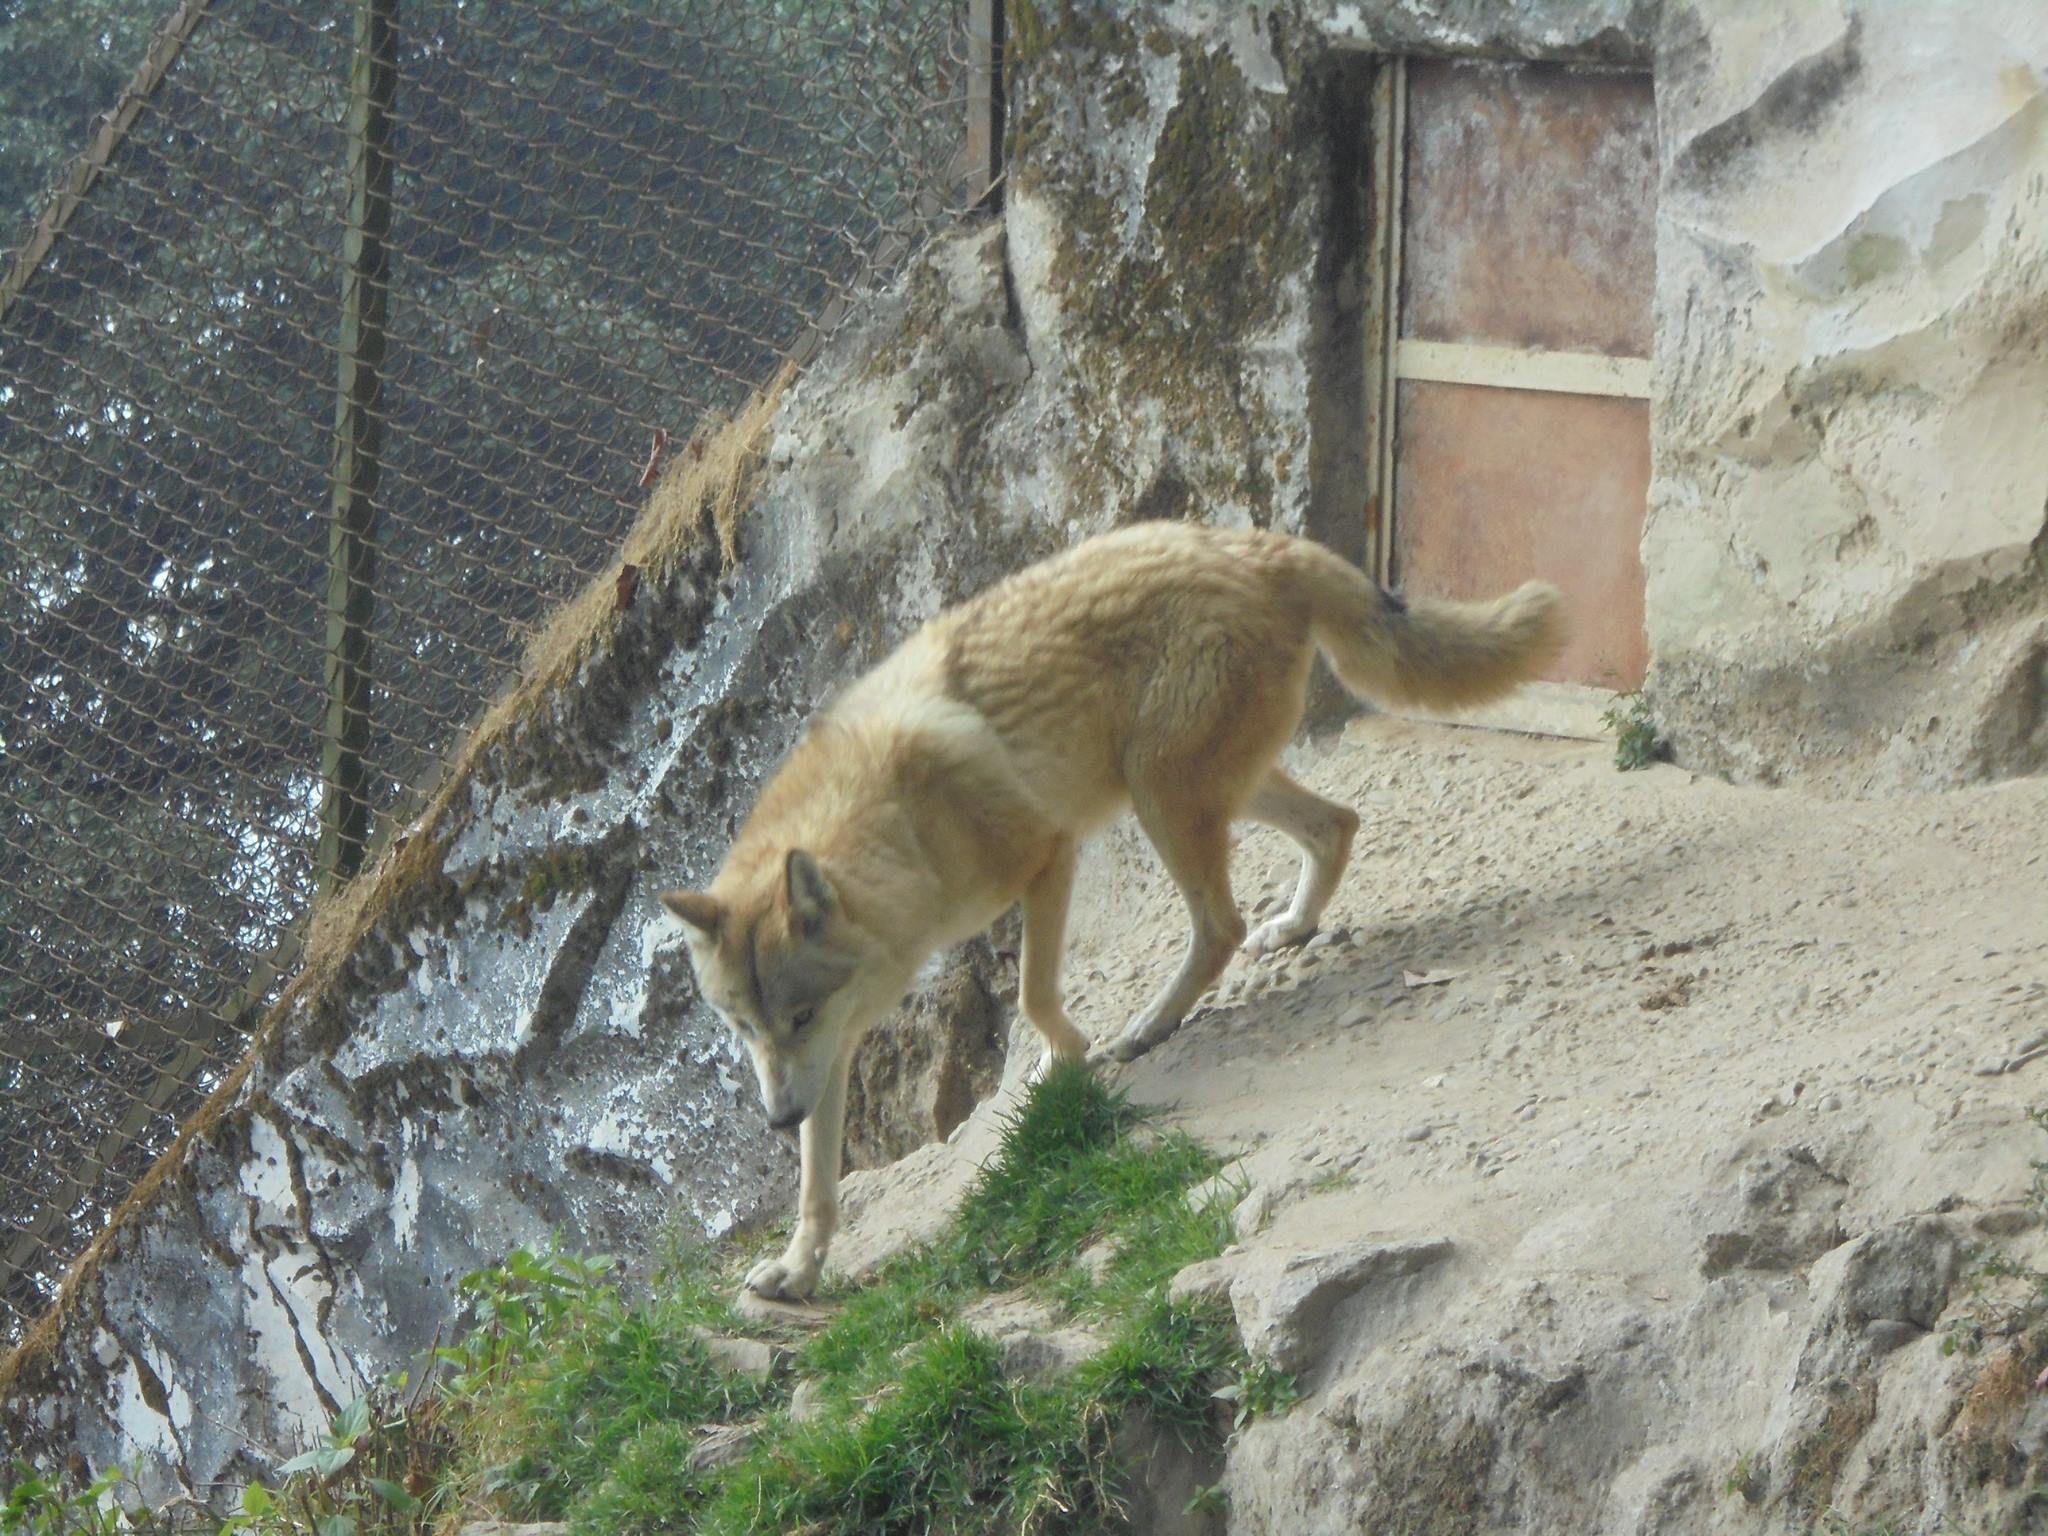 Himalayan Wolf Zoo in india, Himalayan, British government